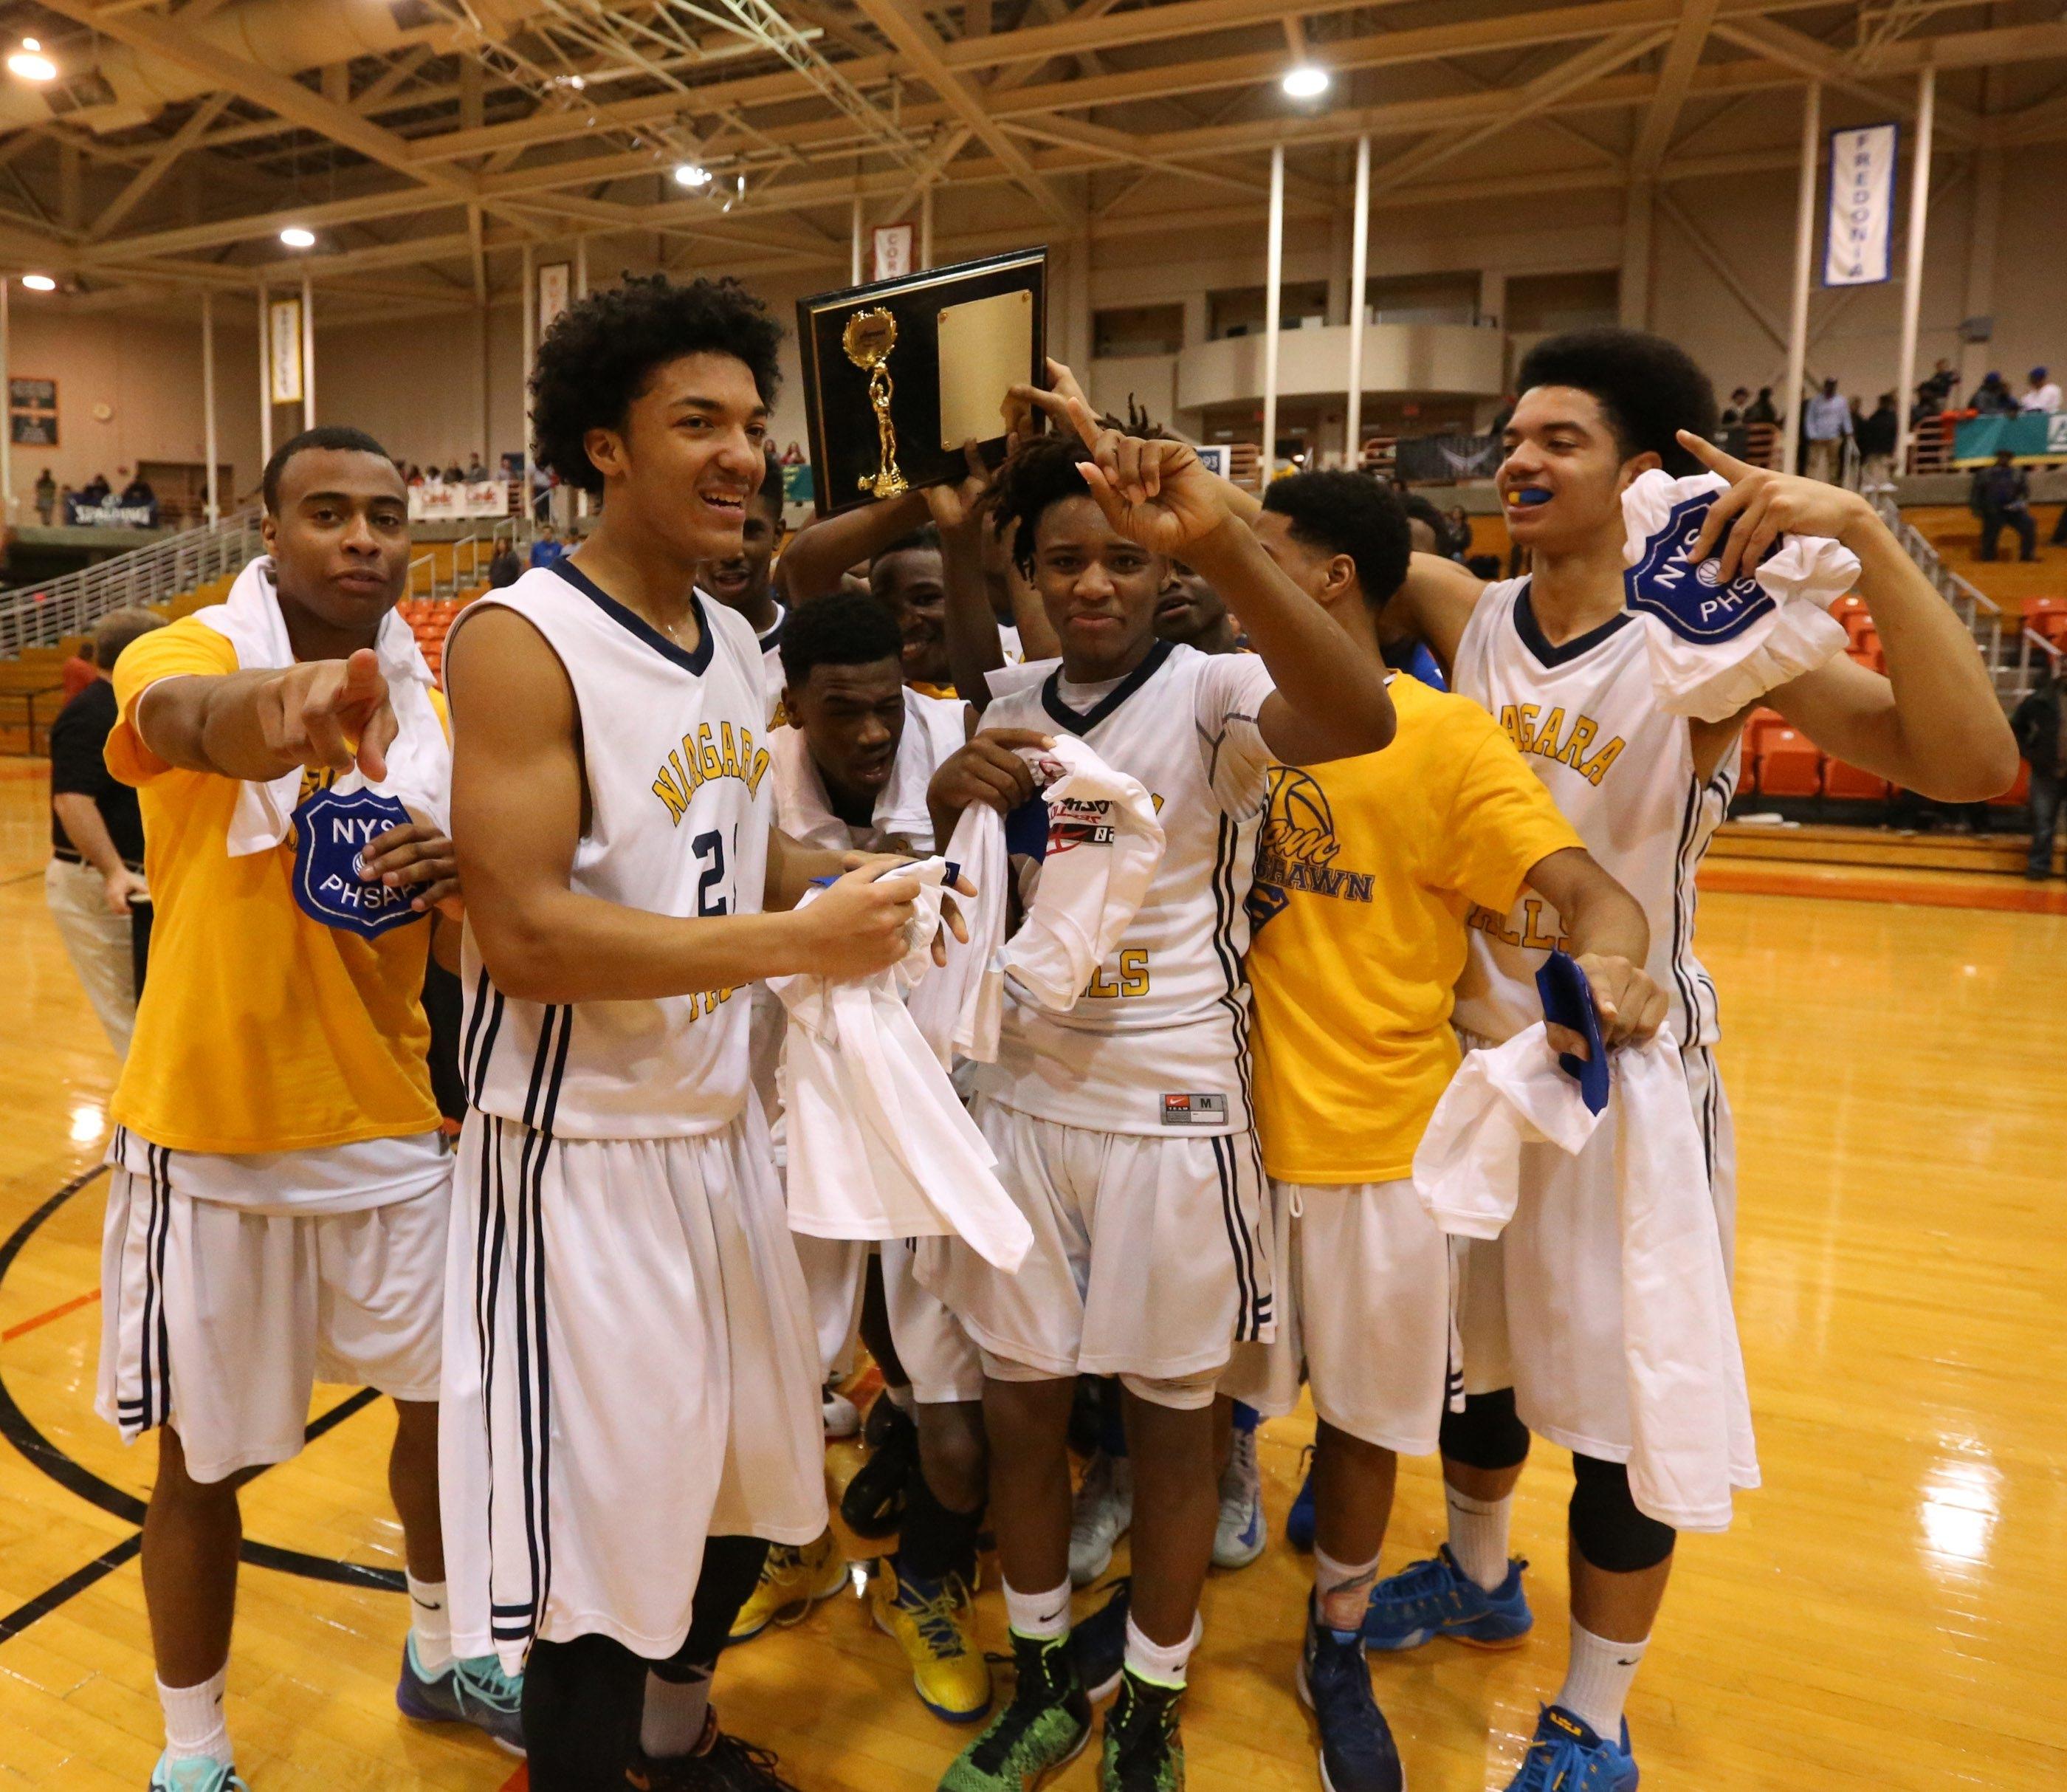 The Niagara Falls boys basketball team celebrates its 58-44 win over Jamestown Saturday night.